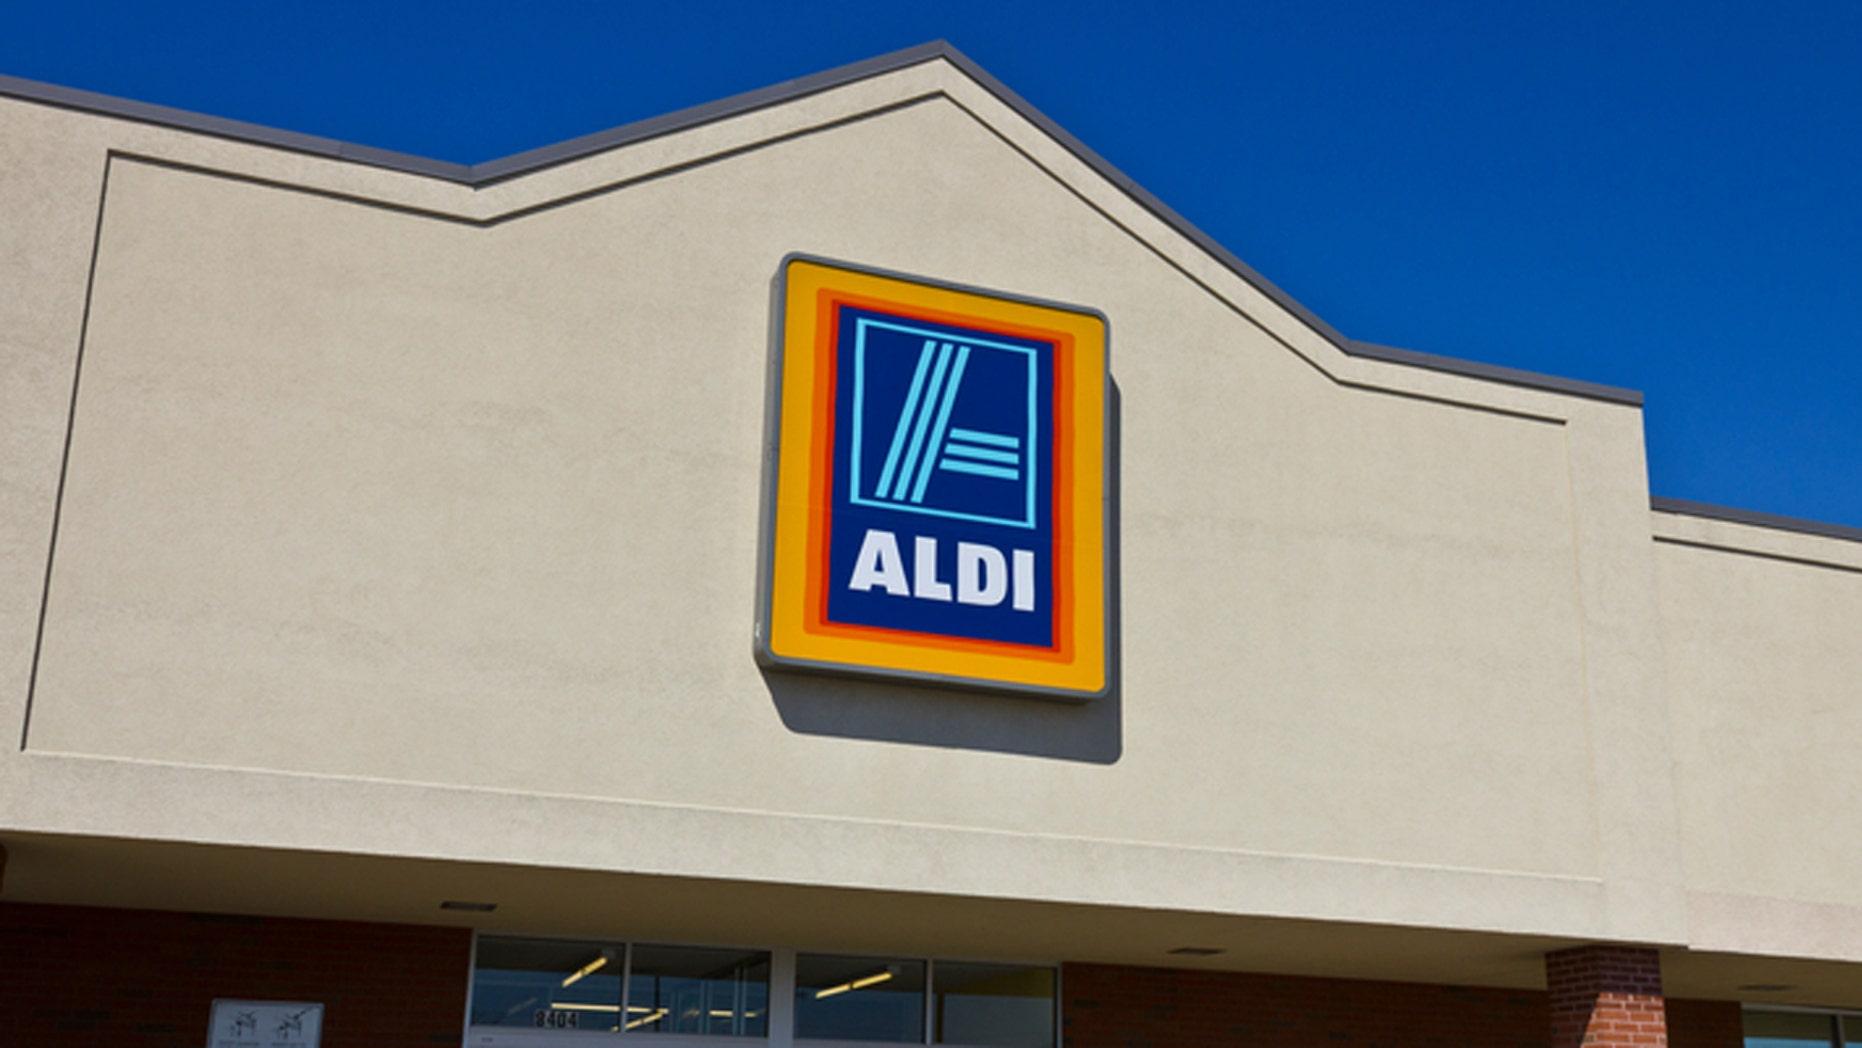 Indianapolis, U.S. - April 16, 2016: Aldi Discount Supermarket. Aldi is Simply Smarter Shopping I